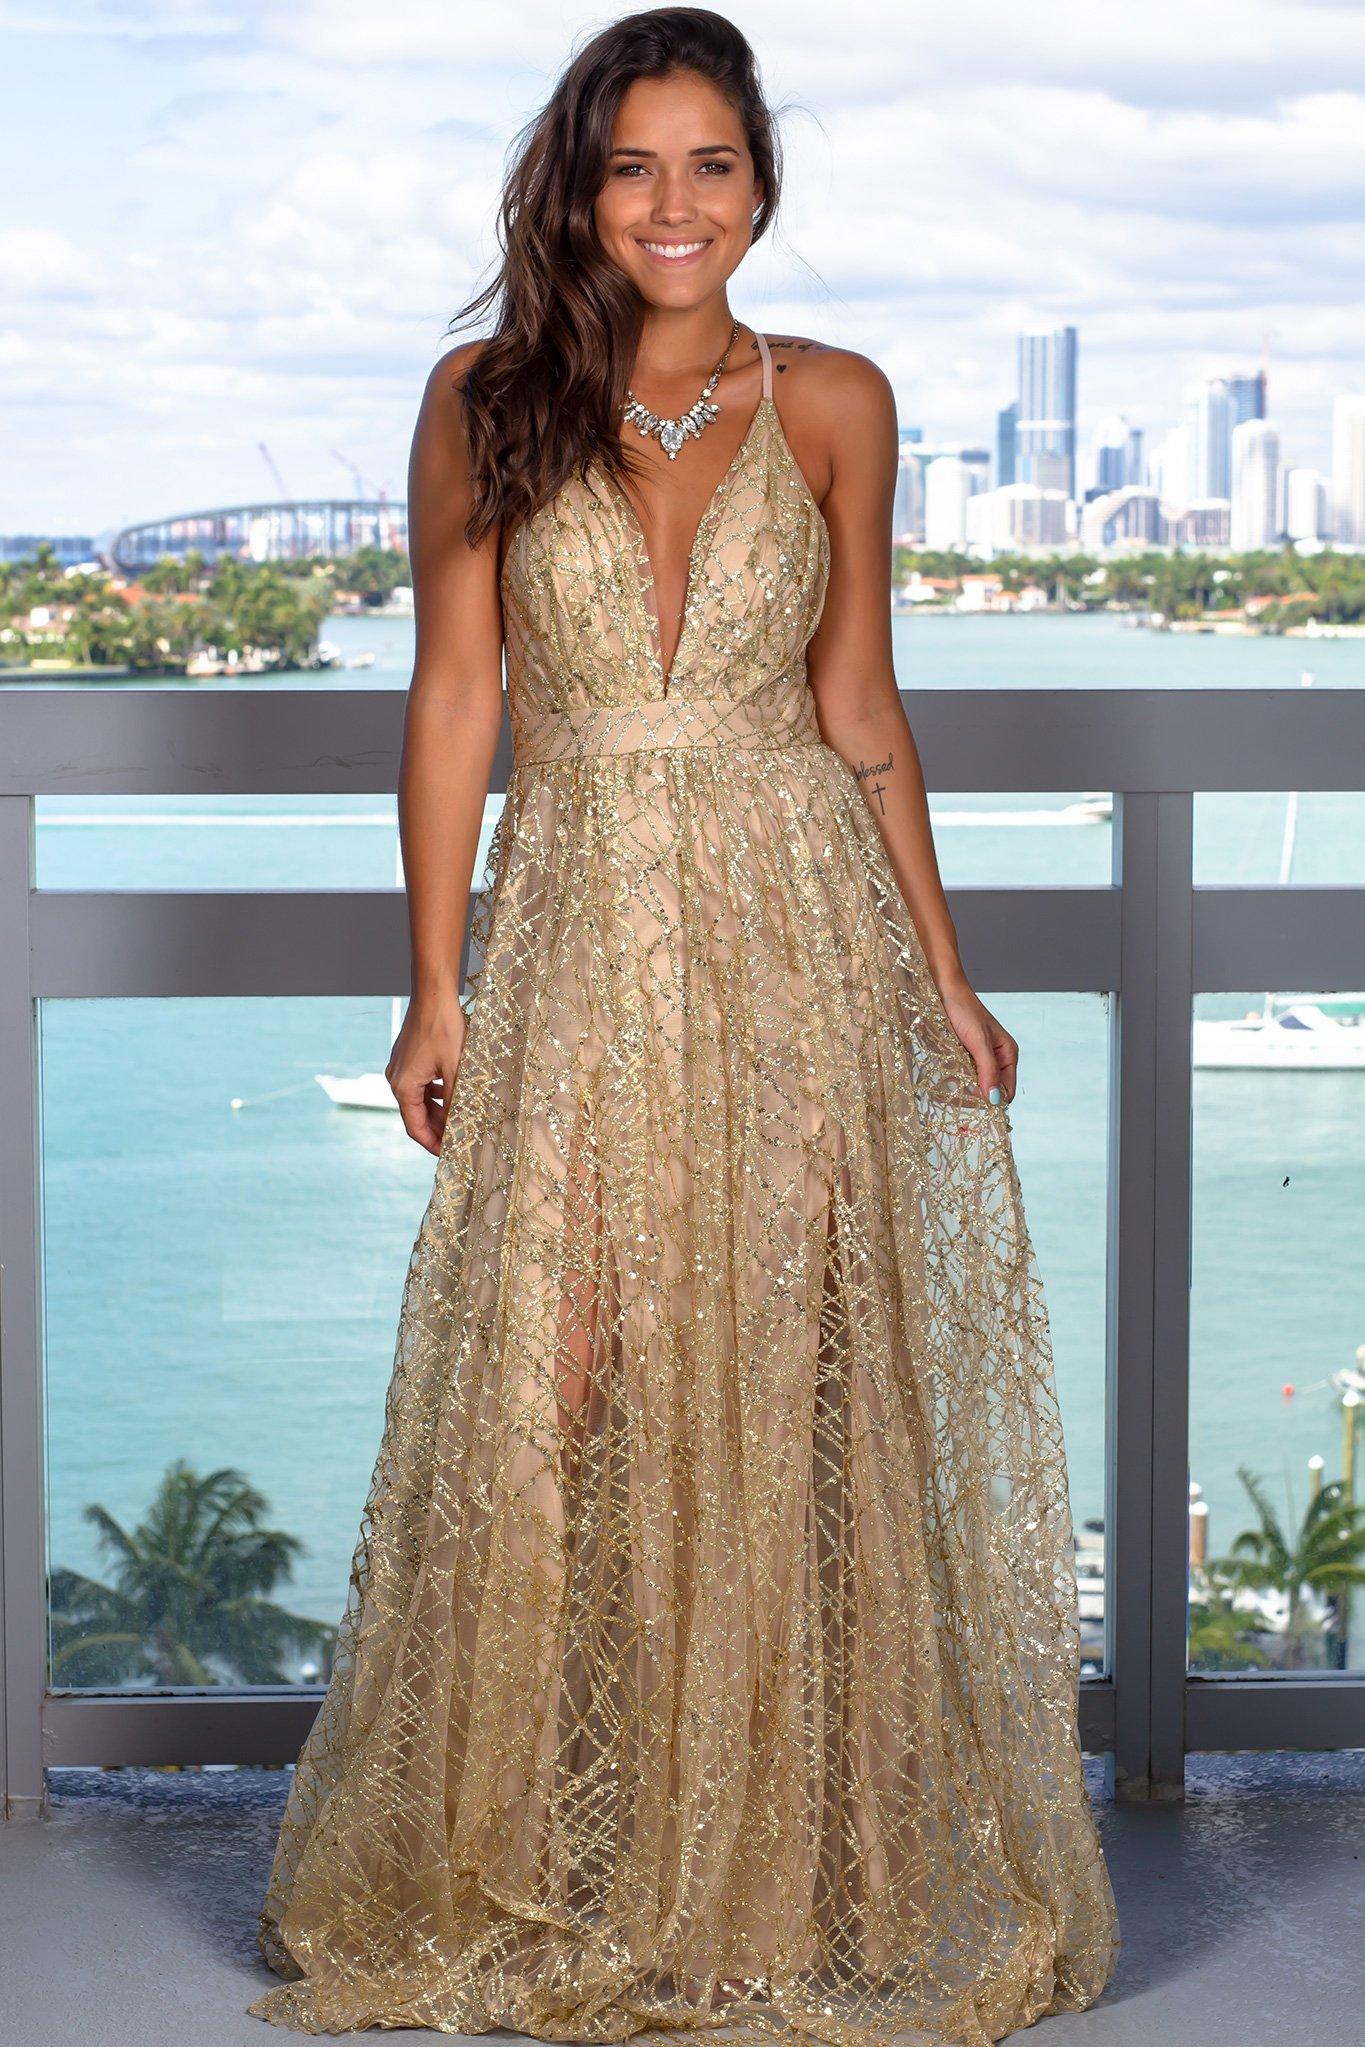 Gold Maxi Dress With Sequins Gold Maxi Dress Maxi Dress Floral Lace Maxi Dress [ 2047 x 1365 Pixel ]